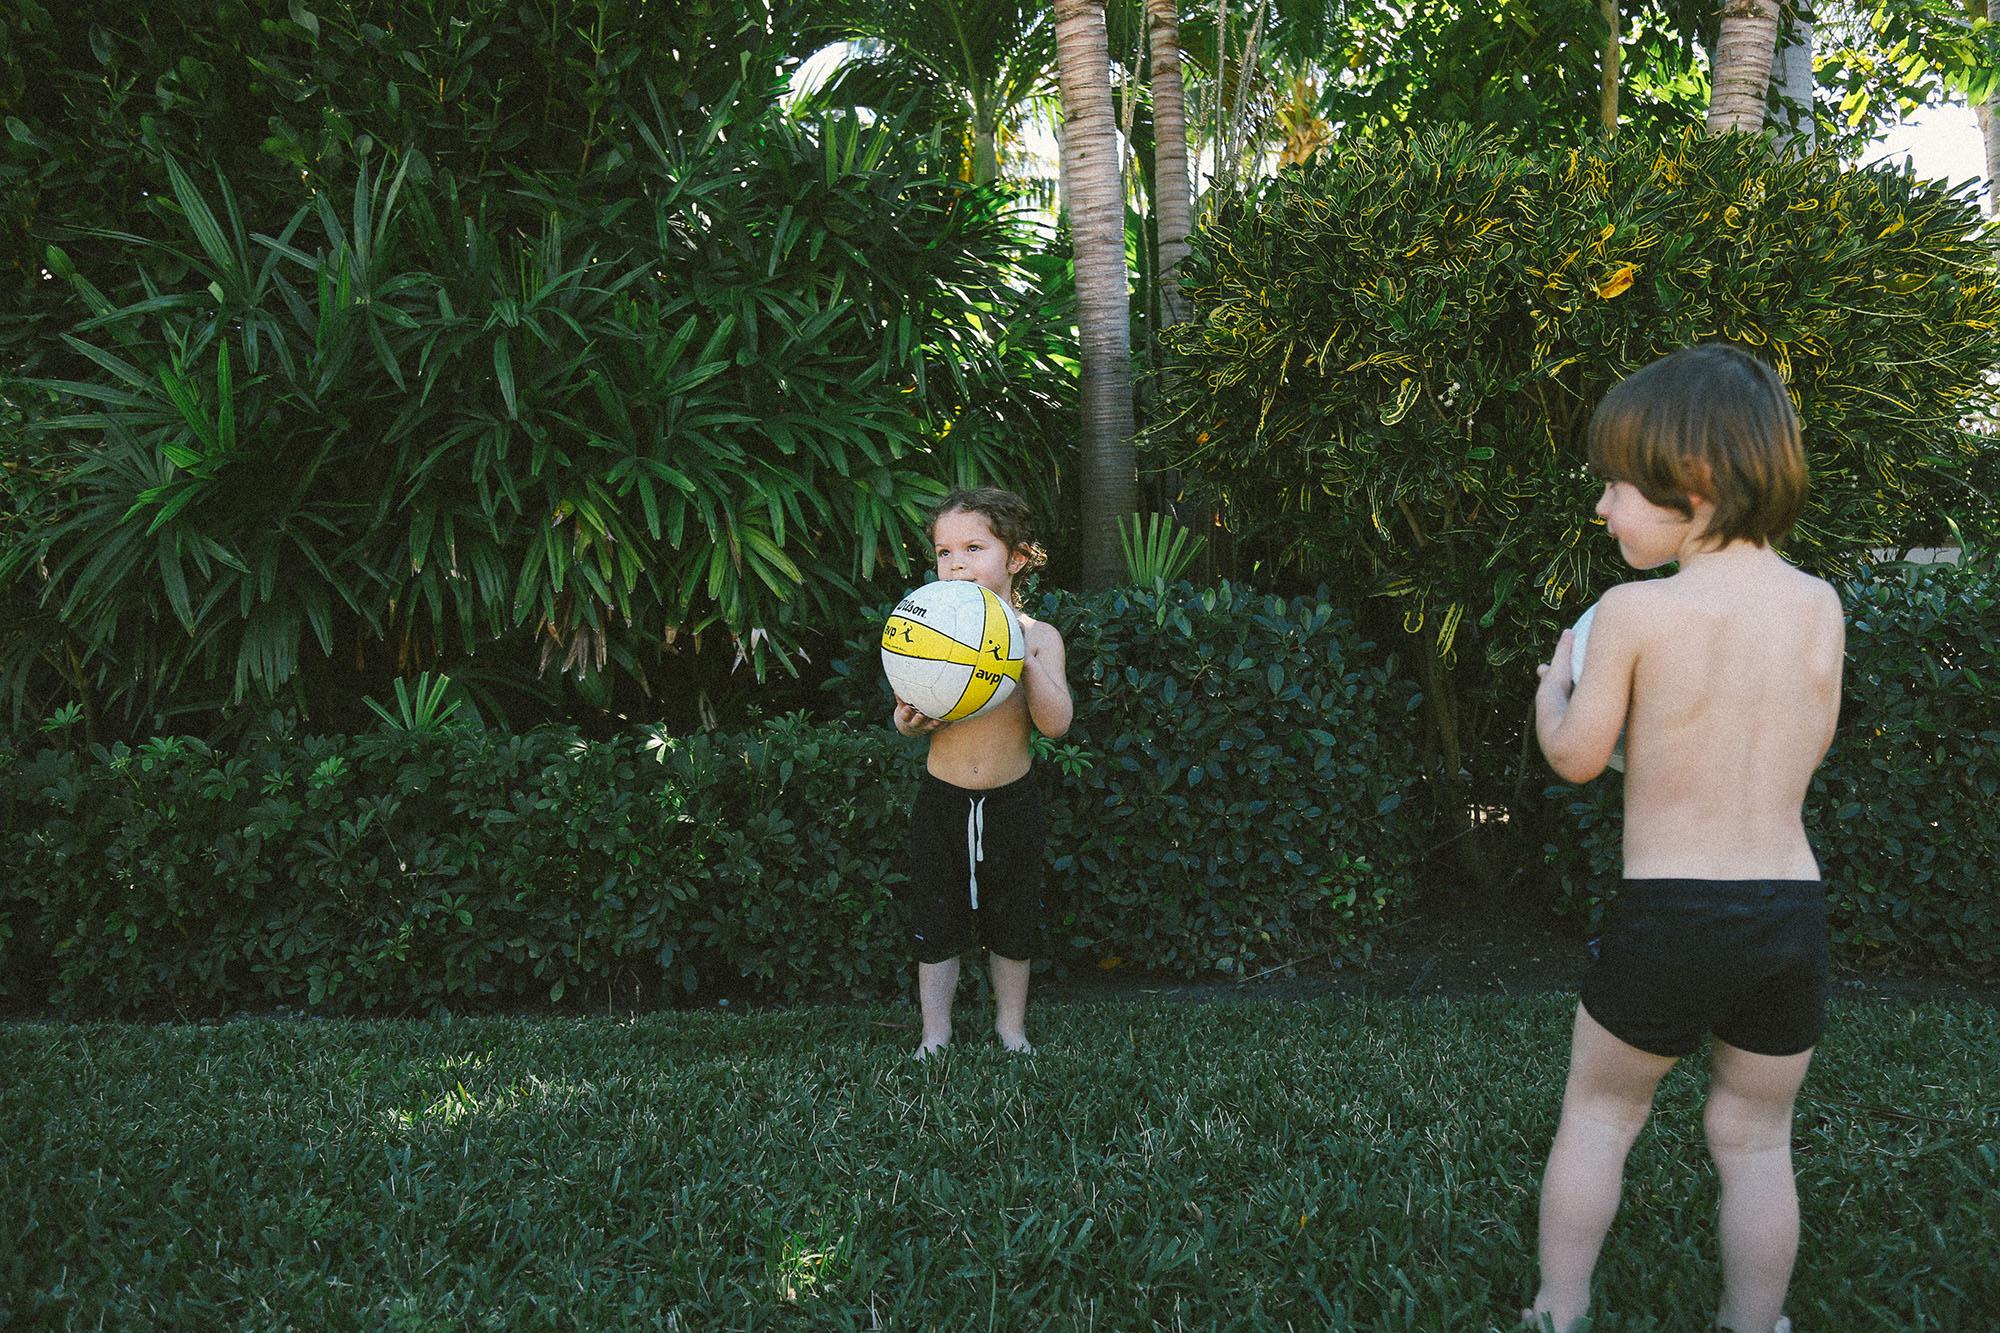 nhl_all_star_break_miami_toddlers78.jpg